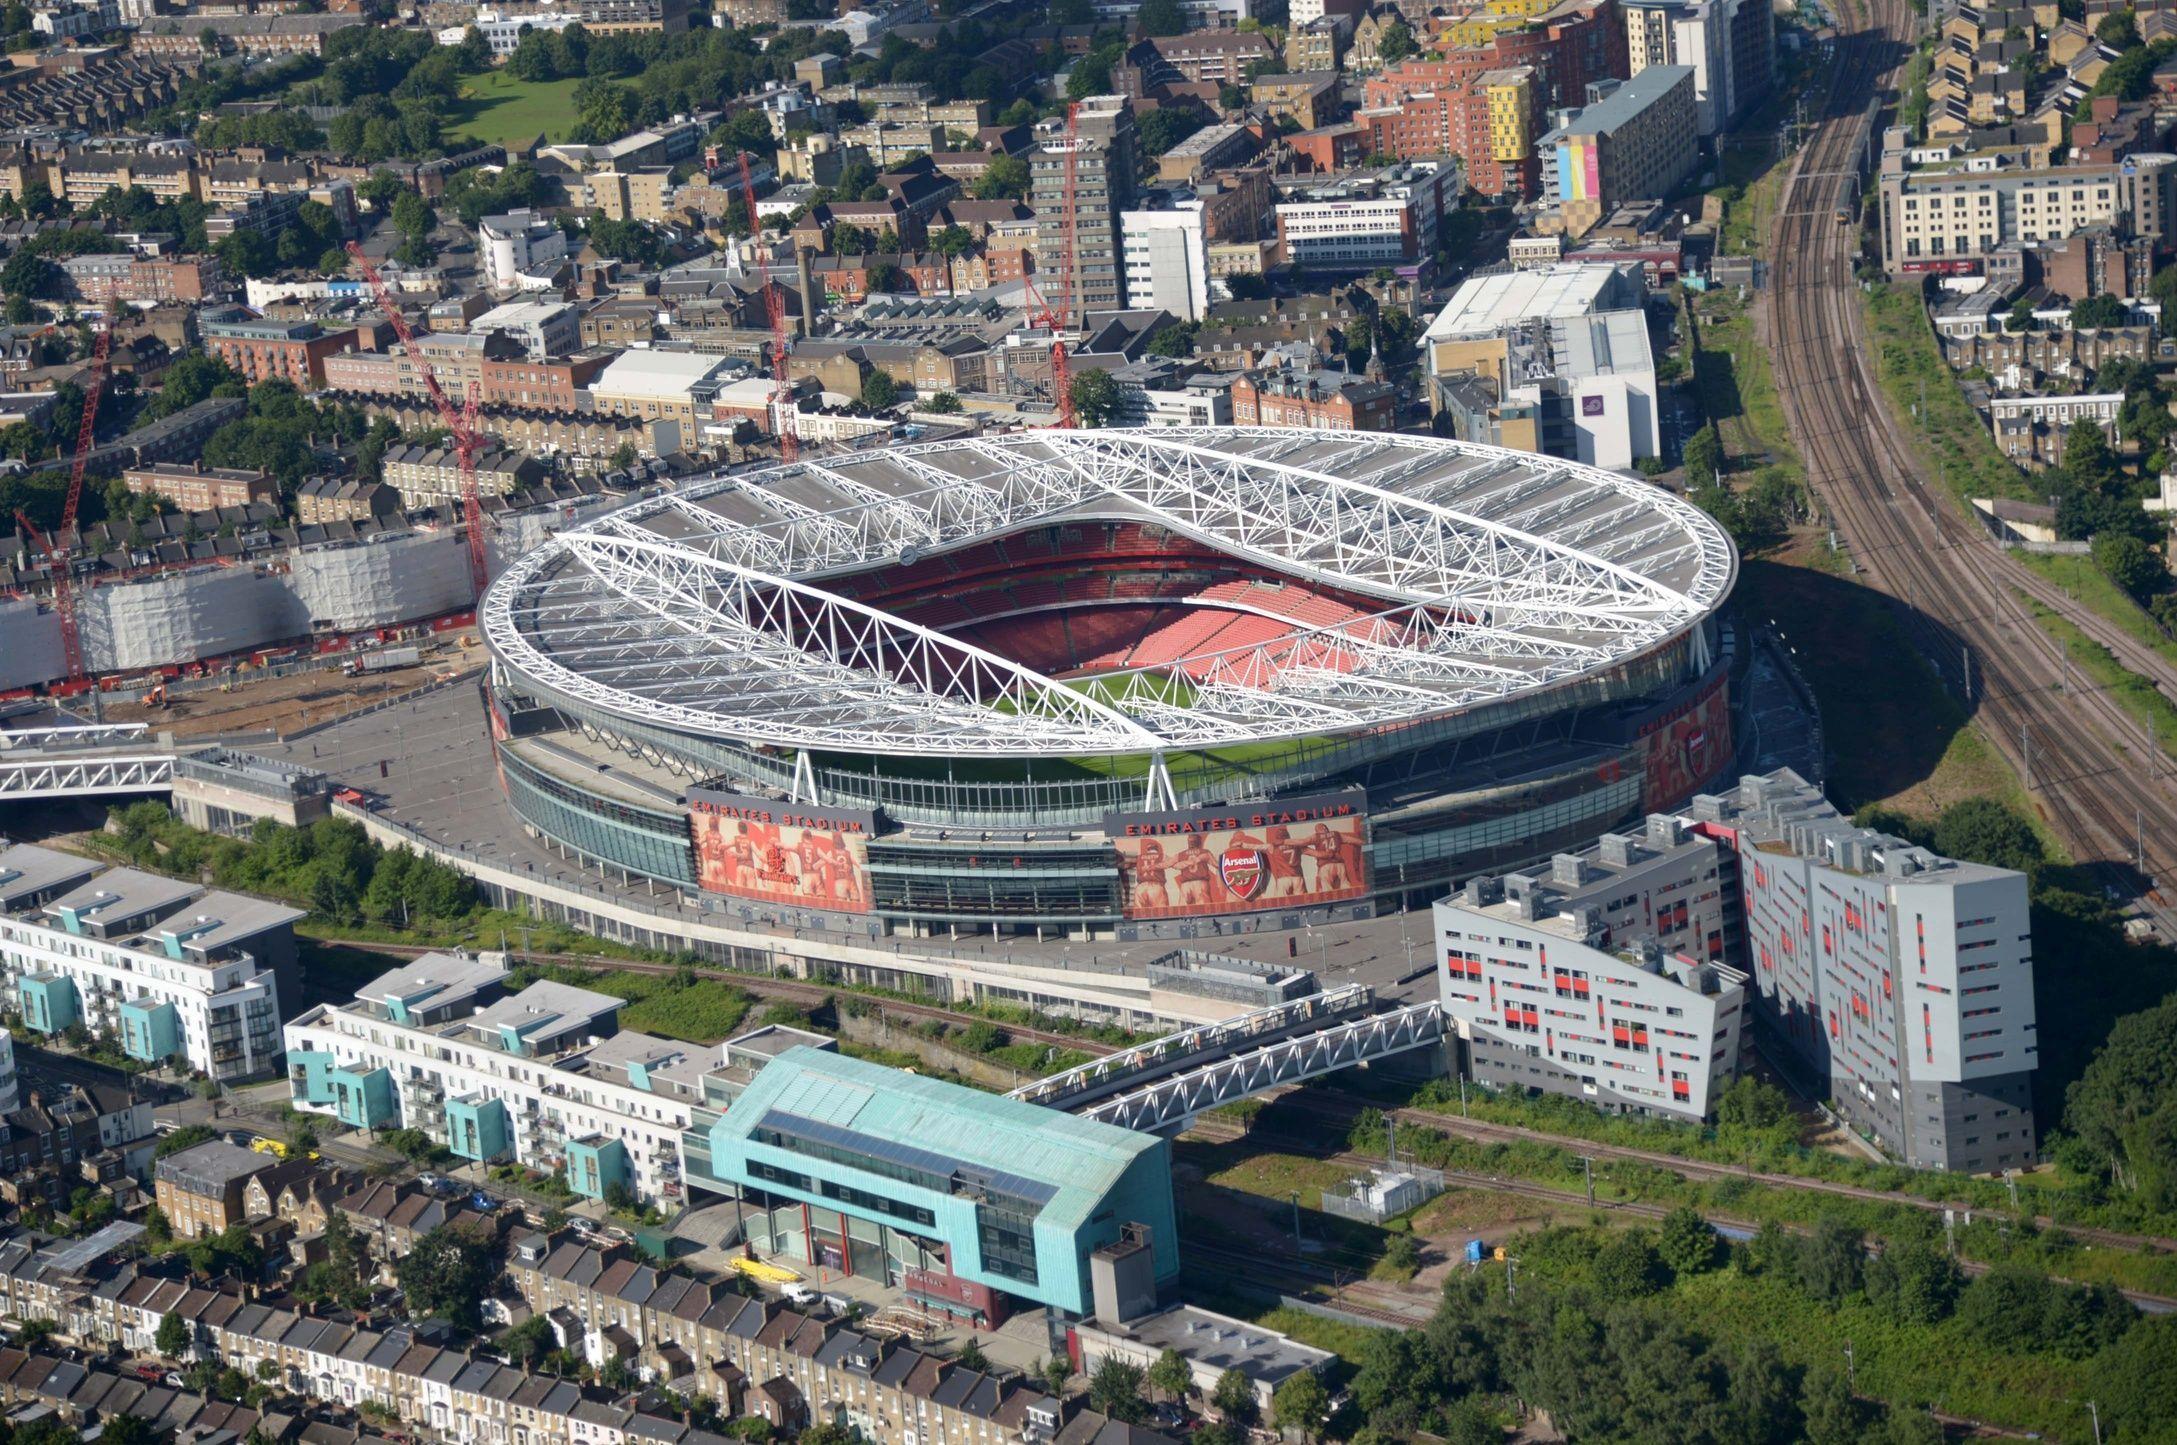 ¿Quién juega en el Emirates Stadium?